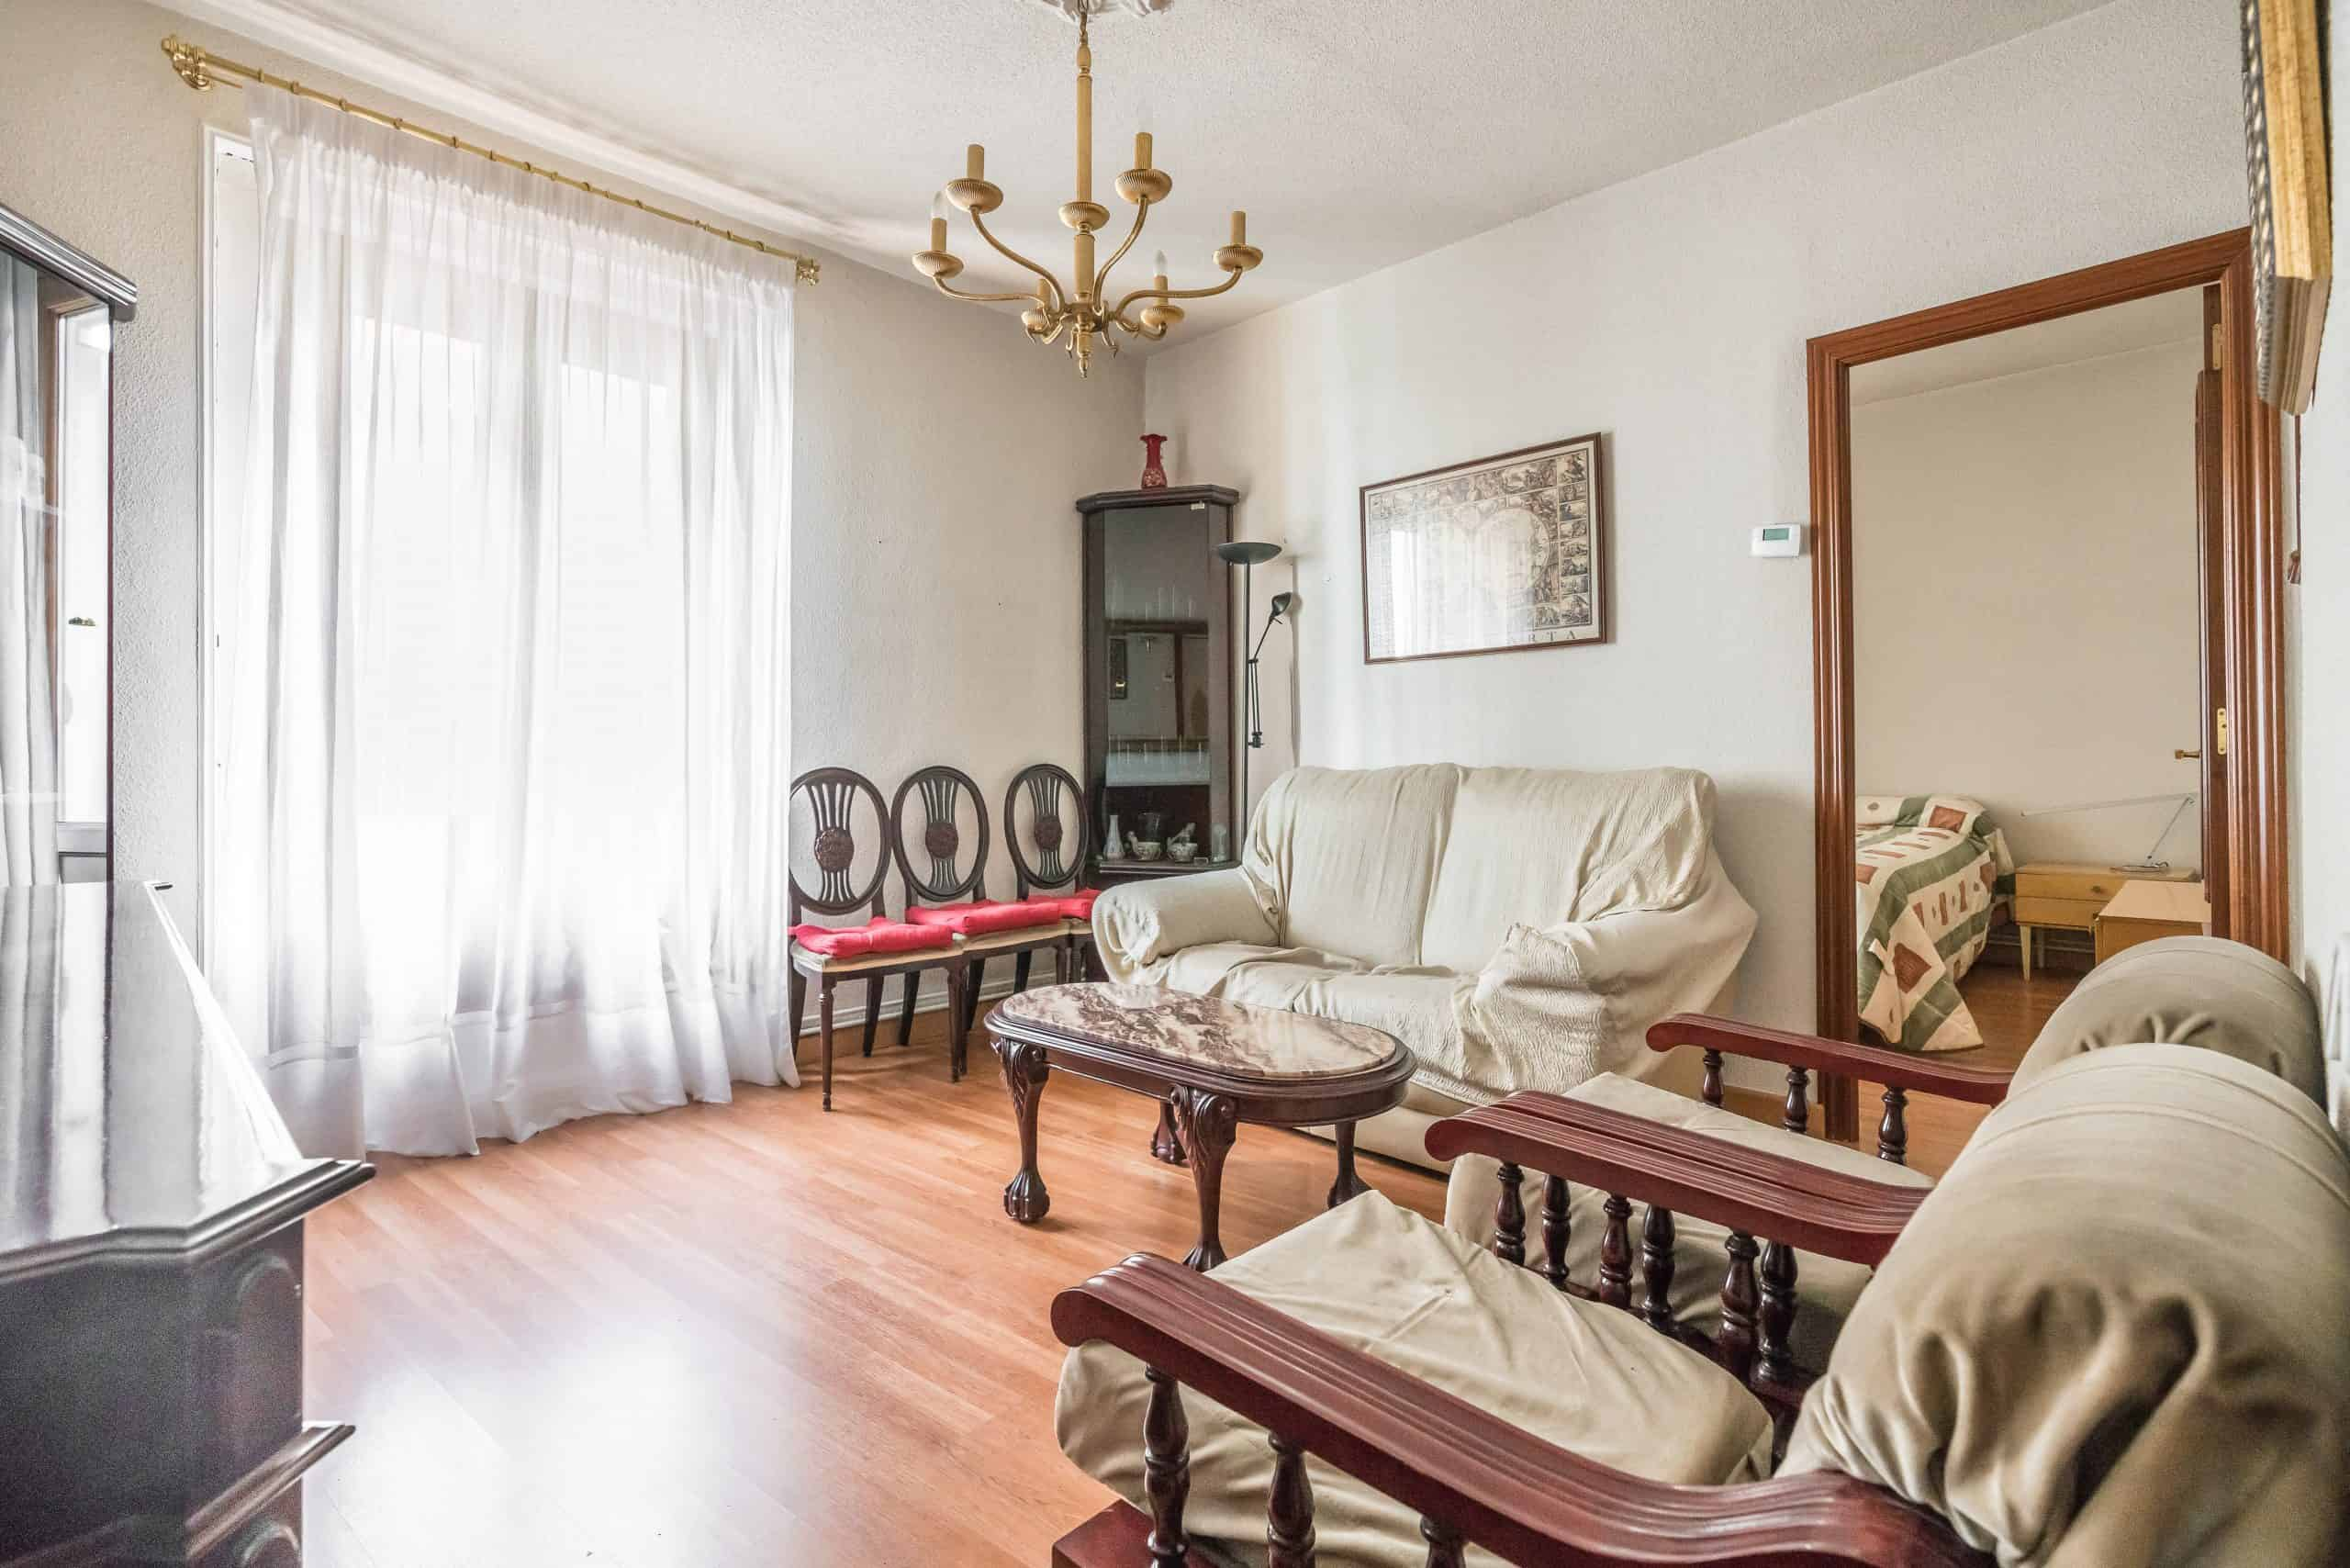 1 SALON (2) (Copy) Agencia Inmobiliaria de Madrid-FUTUROCASA-Zona ARGANZUELA-